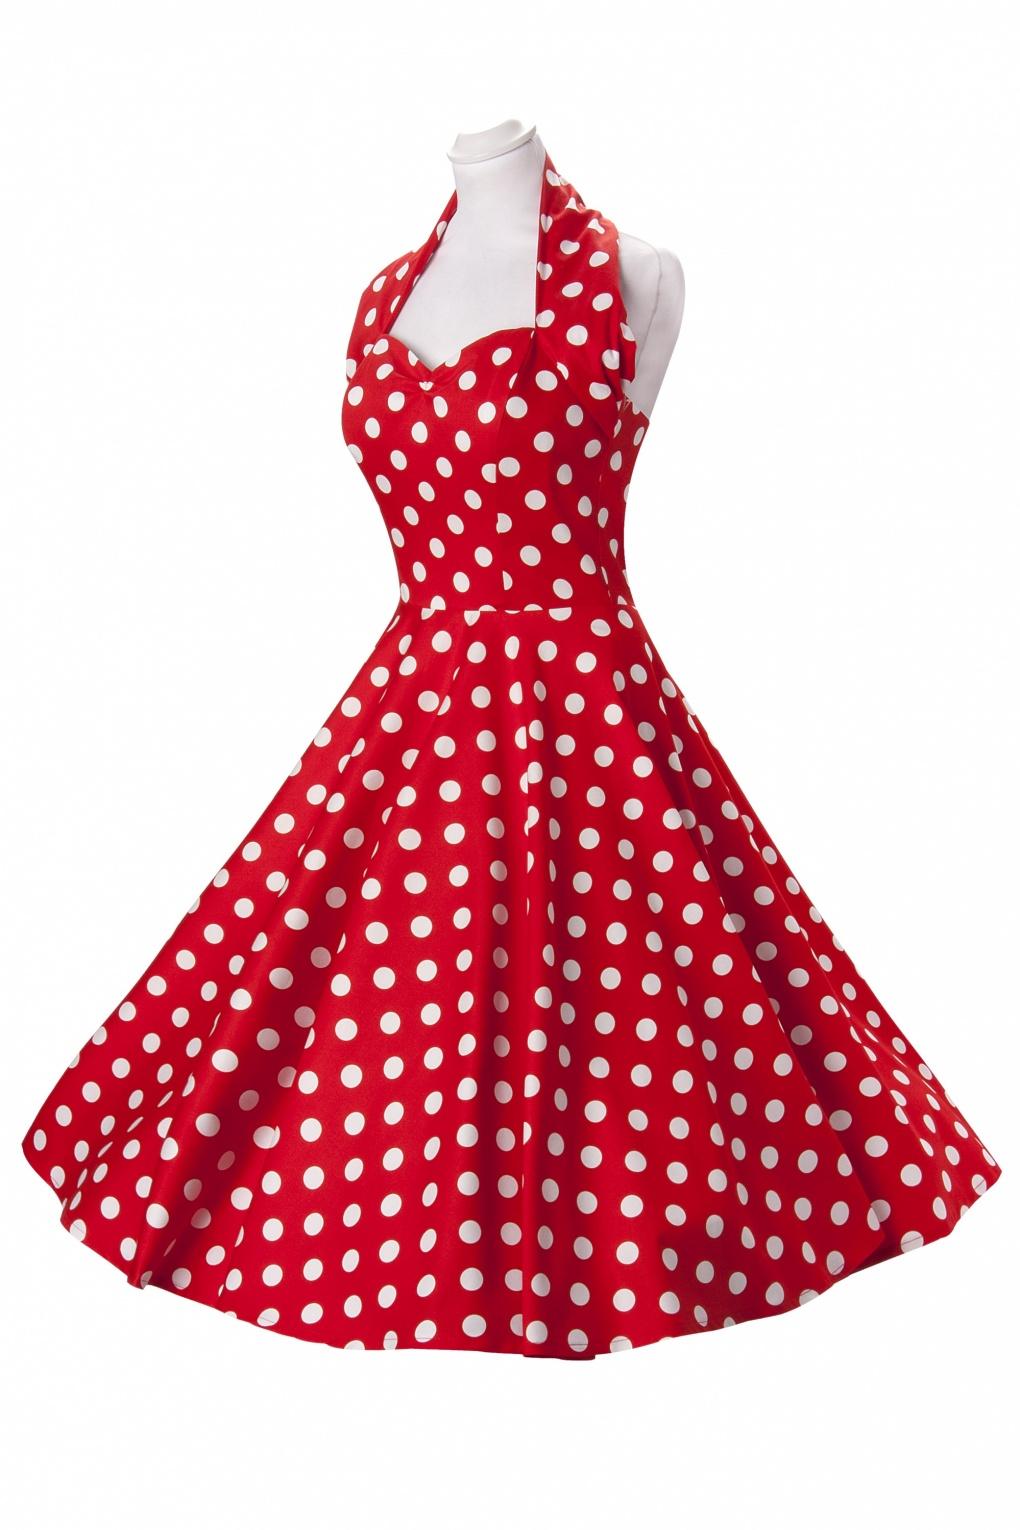 plus length dresses yahoo answers